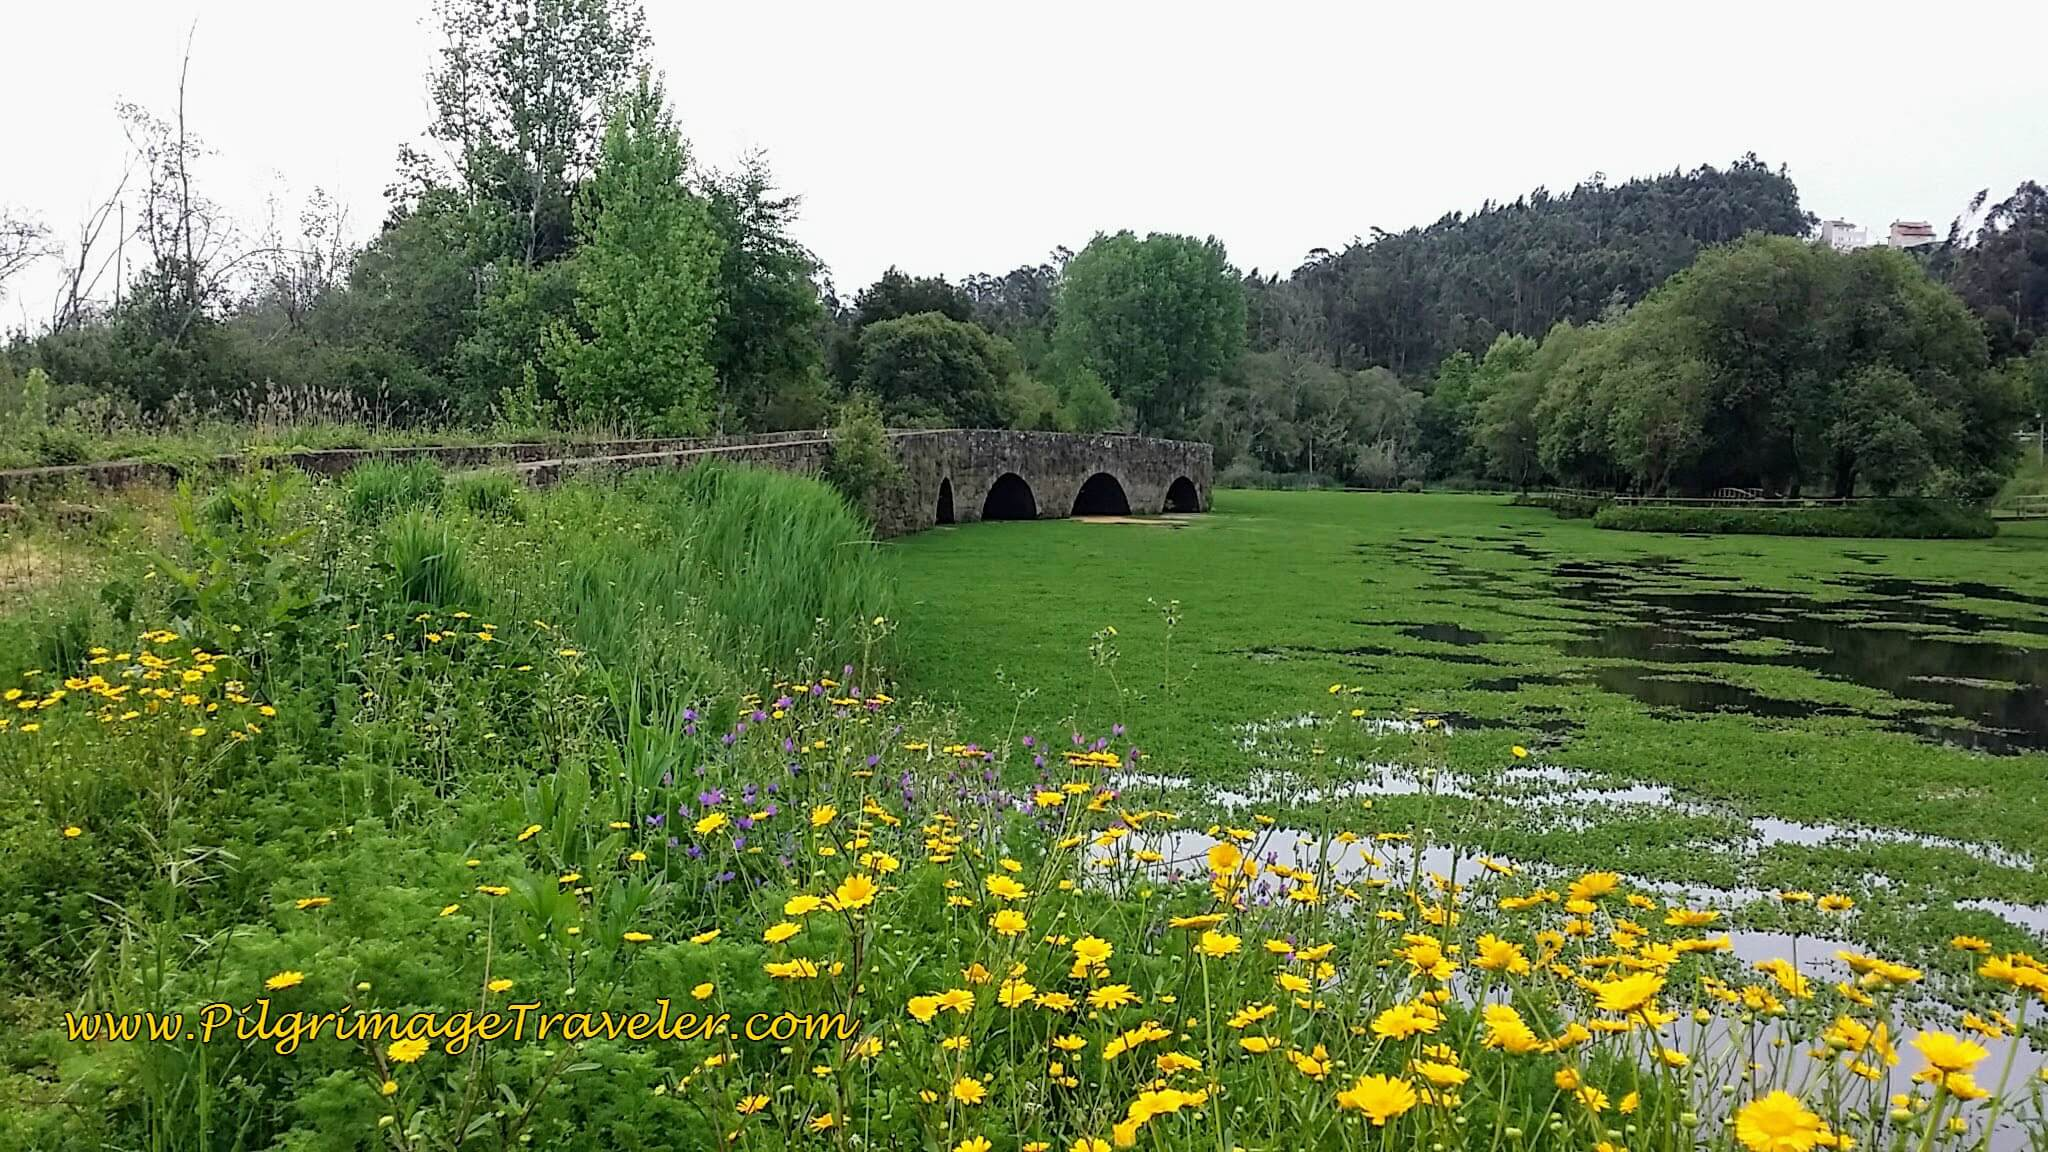 Old Roman Bridge, North of Agueda, Portugal